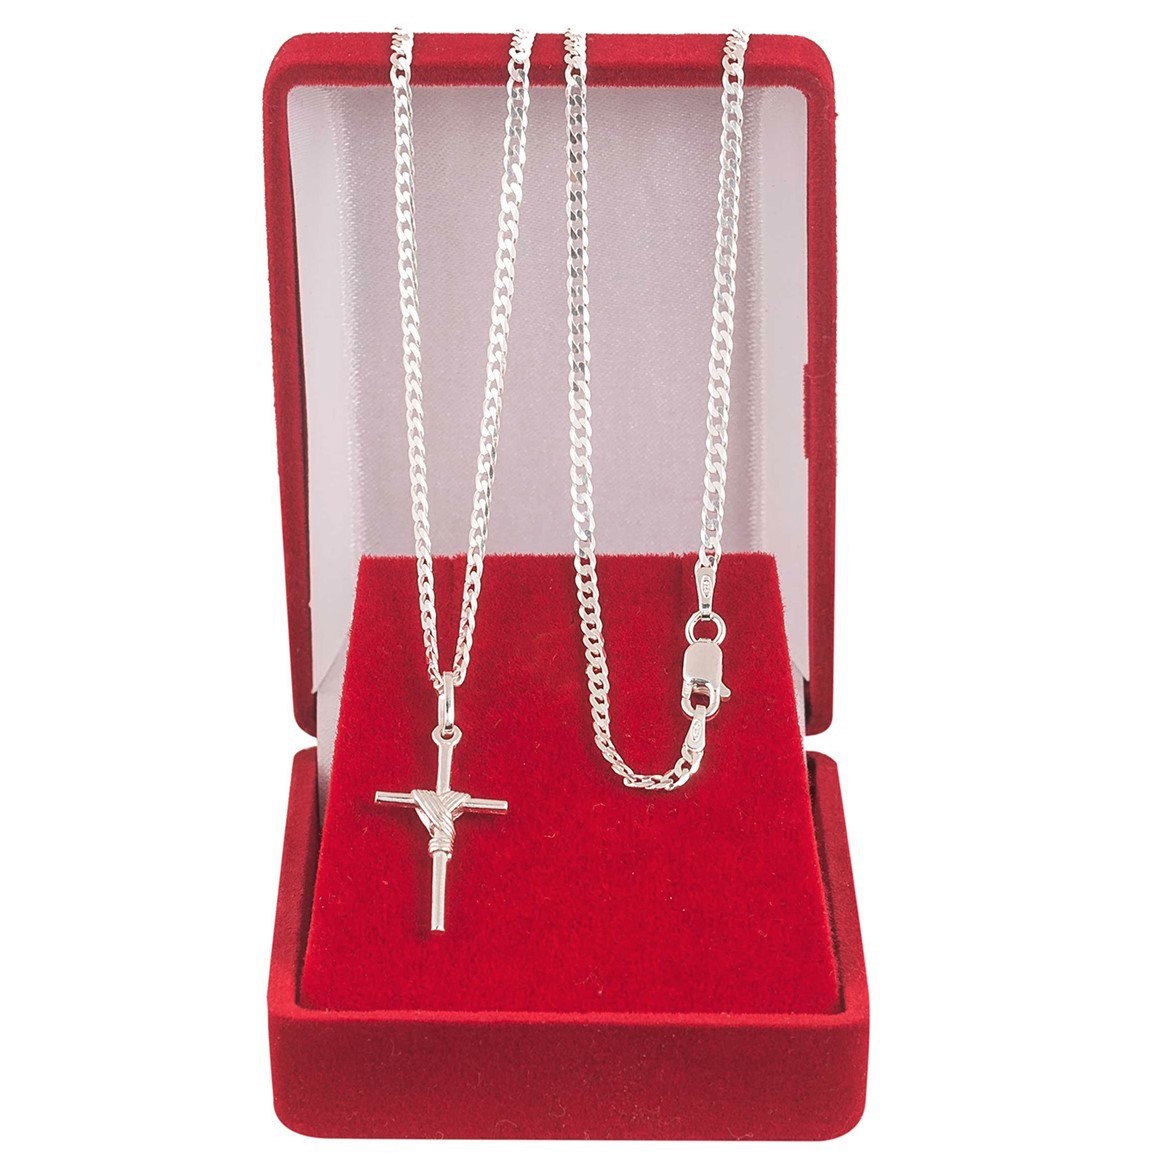 Cordão Corrente Masculina Grumet 70cm Pingente Cruz Crucifixo De Prata 925